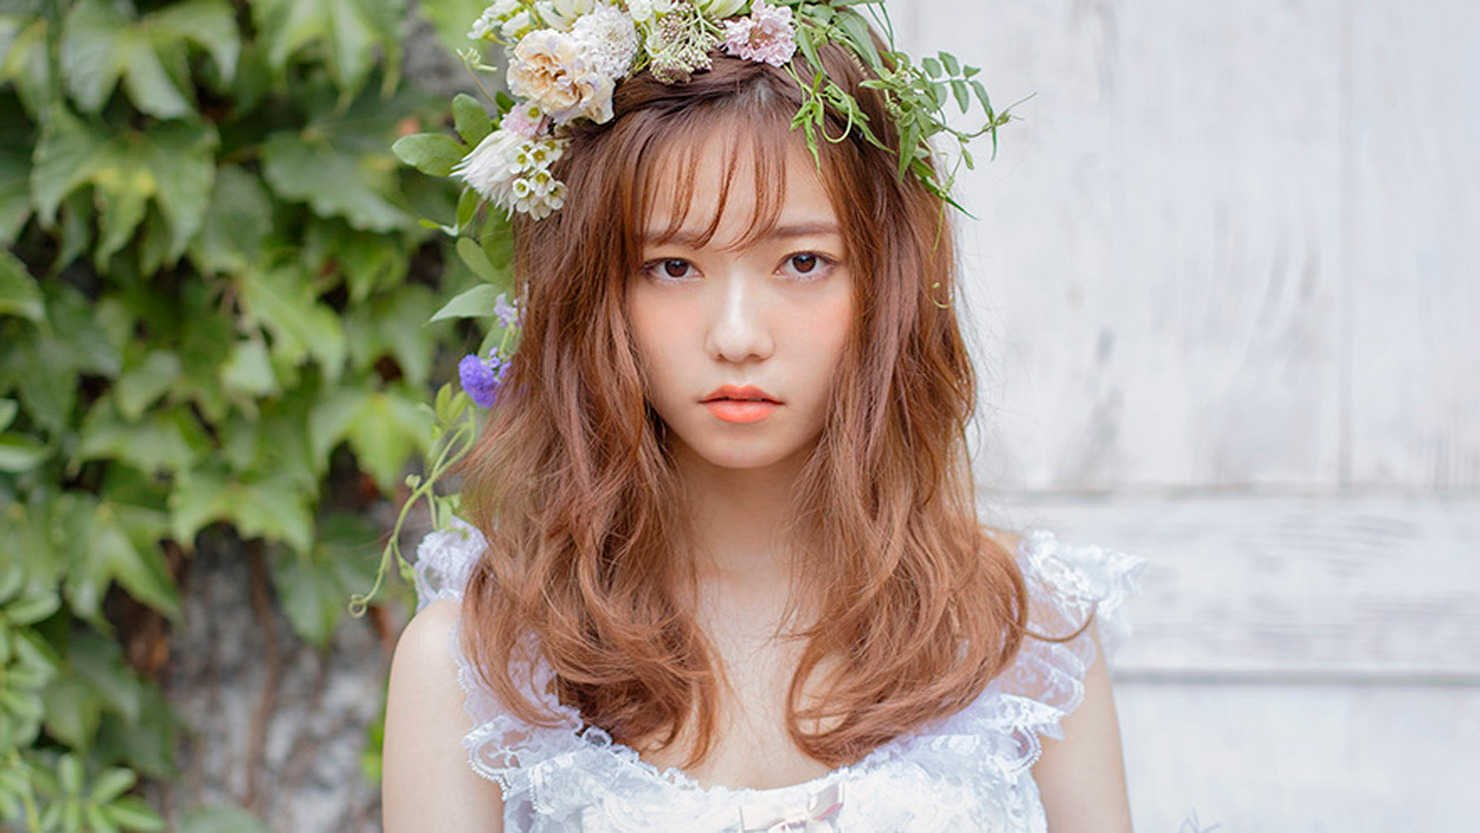 paruru-shimazaki-haruka-01